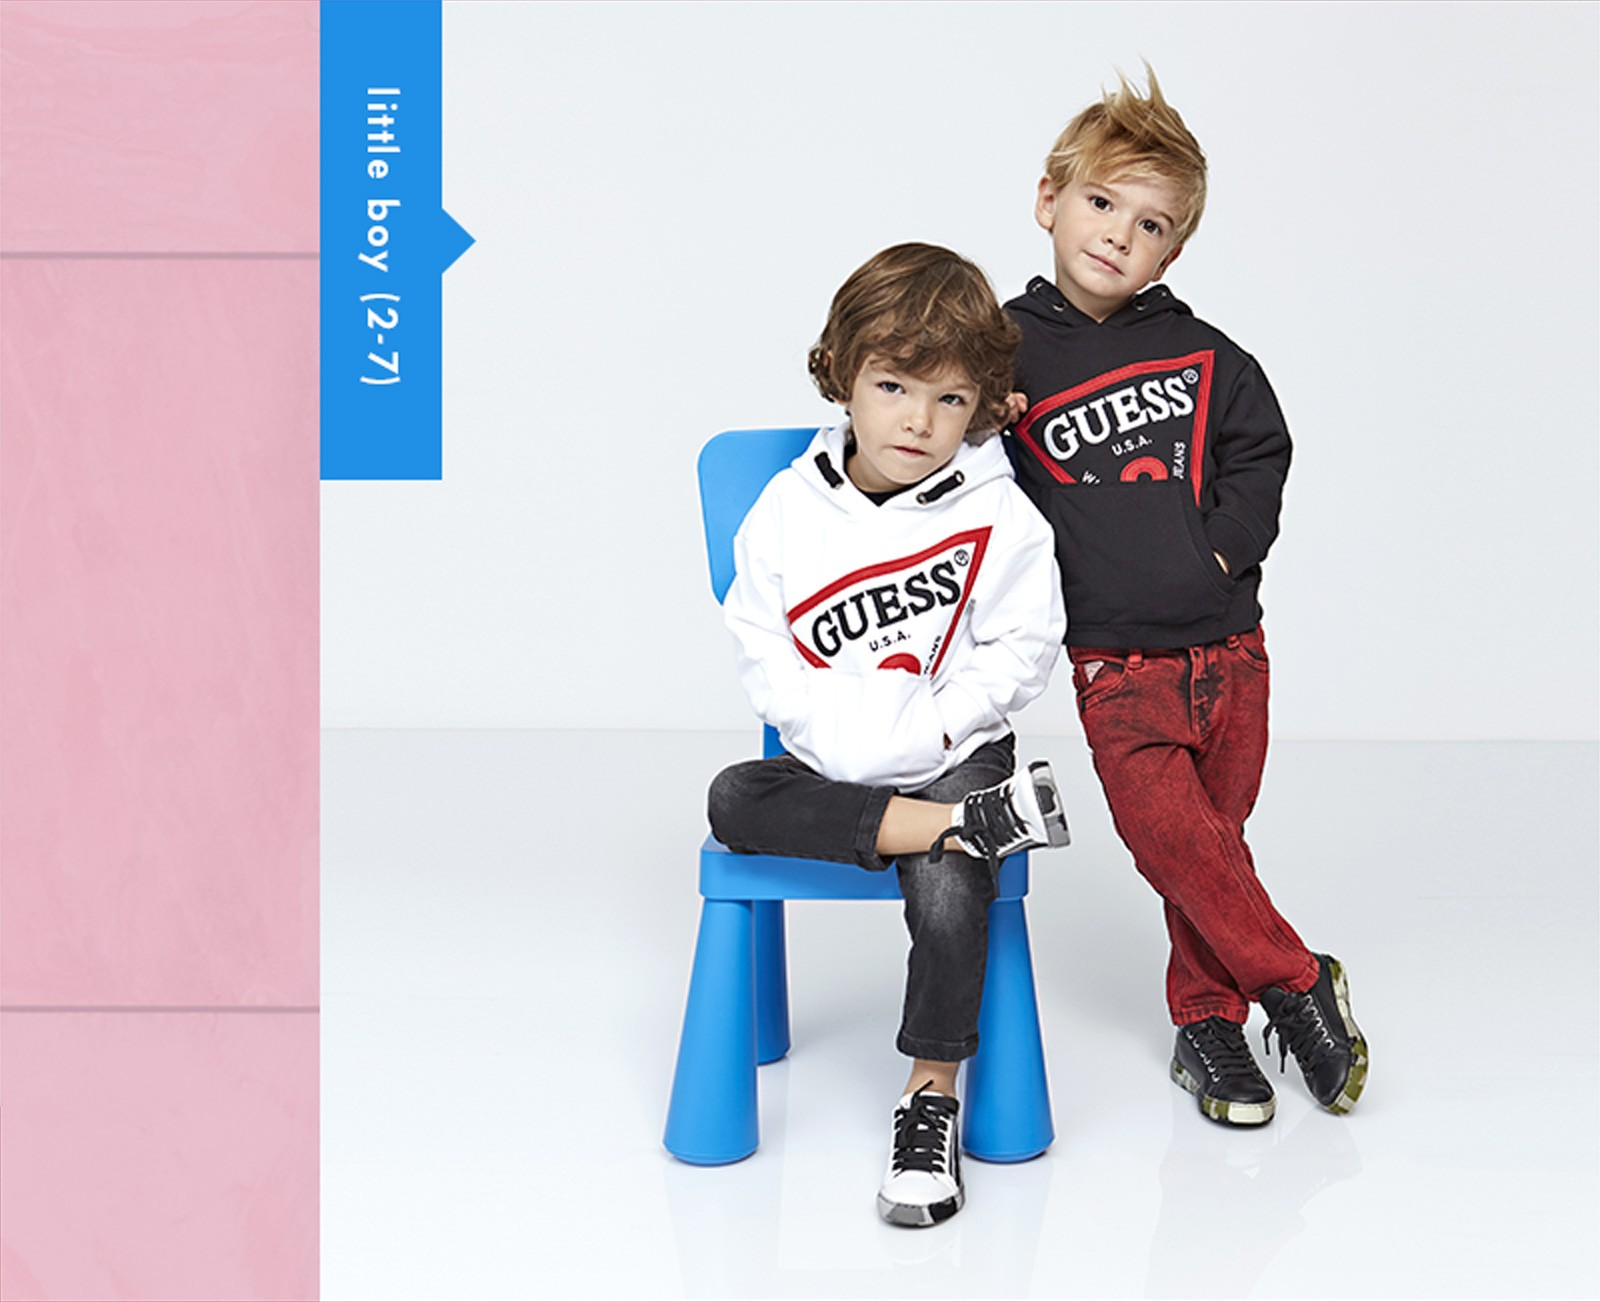 801748381ebc big girl (7-14) big boy (7-14) little girl (2-7) little boy (2-7) baby girl  (0-24m) baby boy (0-24m) · Home · Kids